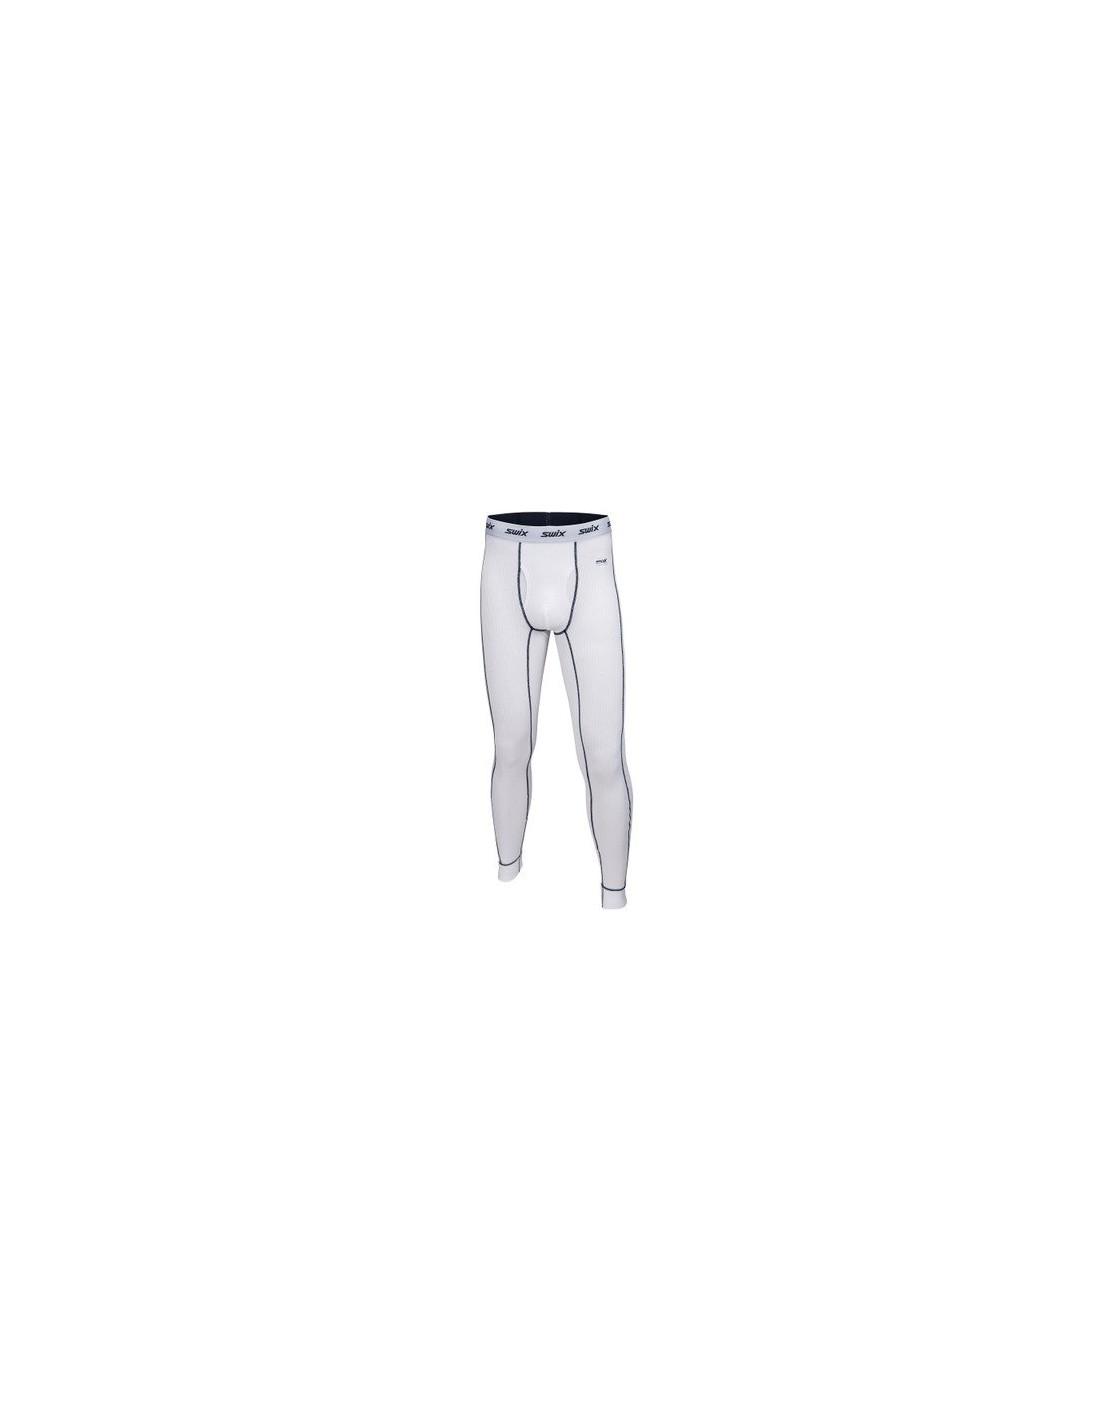 Polyesterlongs Til Herrer Swix RaceX BodyW Pants Herre 41801 399 kr